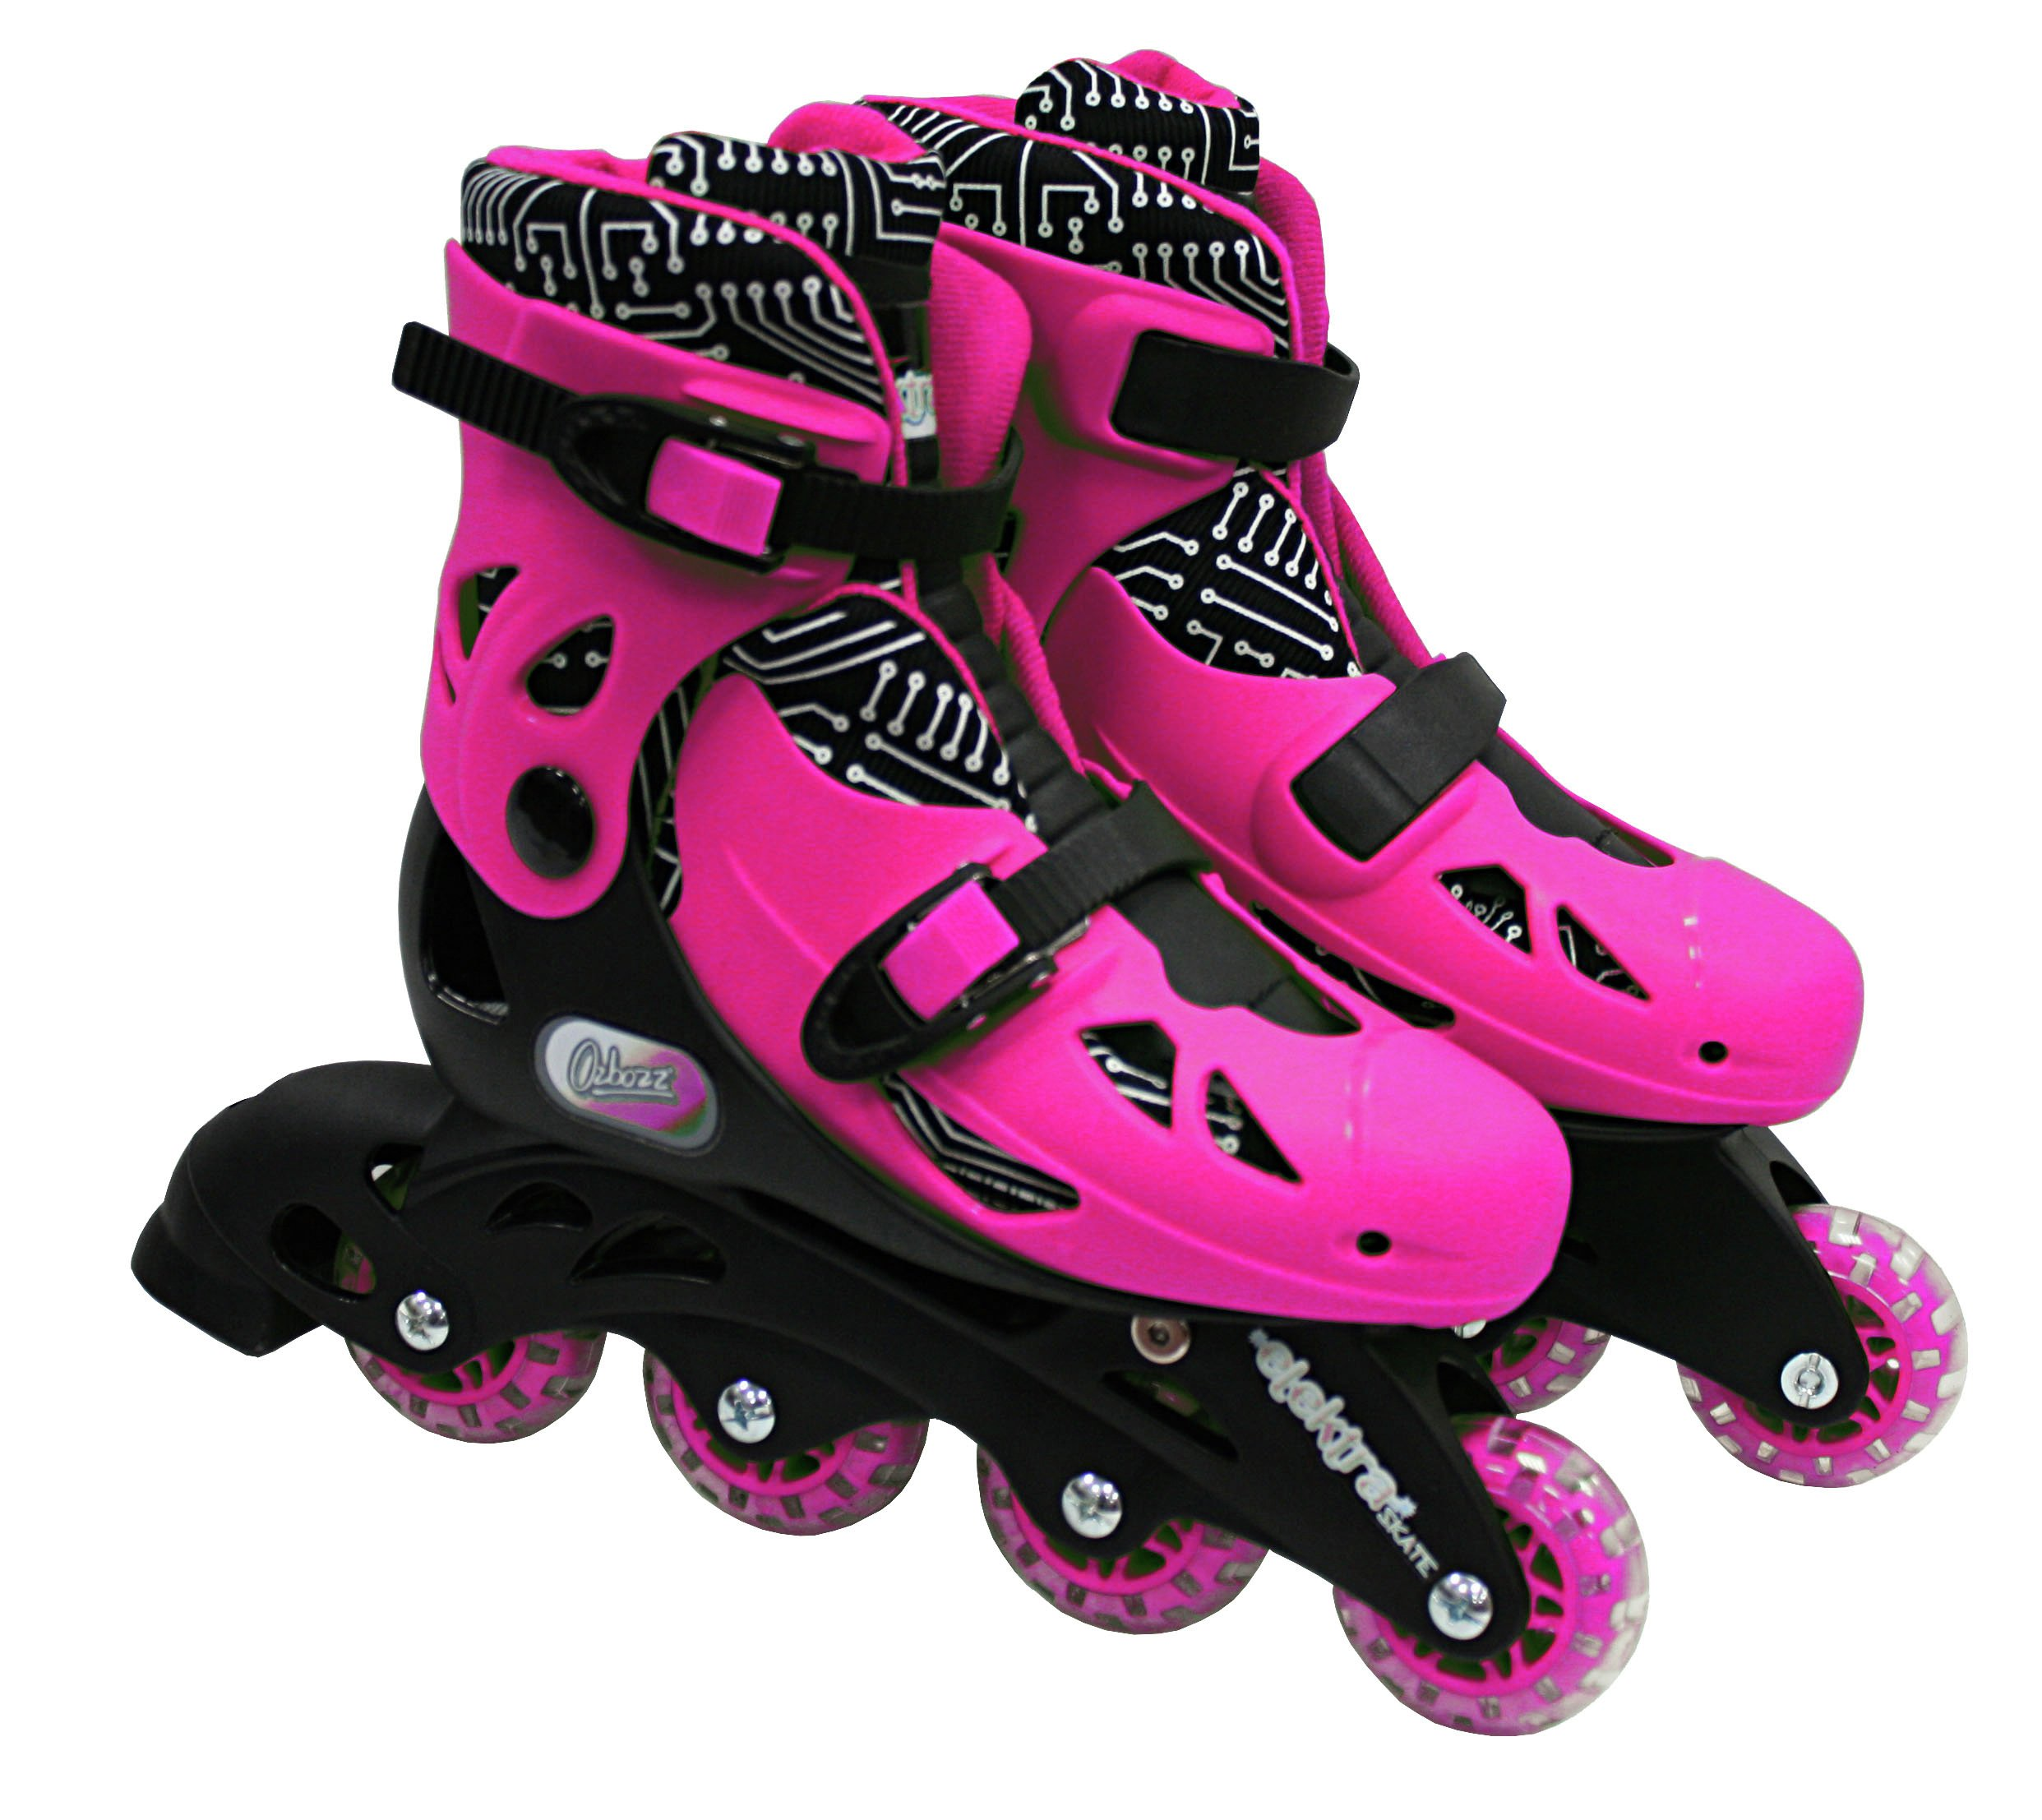 elektra-in-line-boot-skates-pink